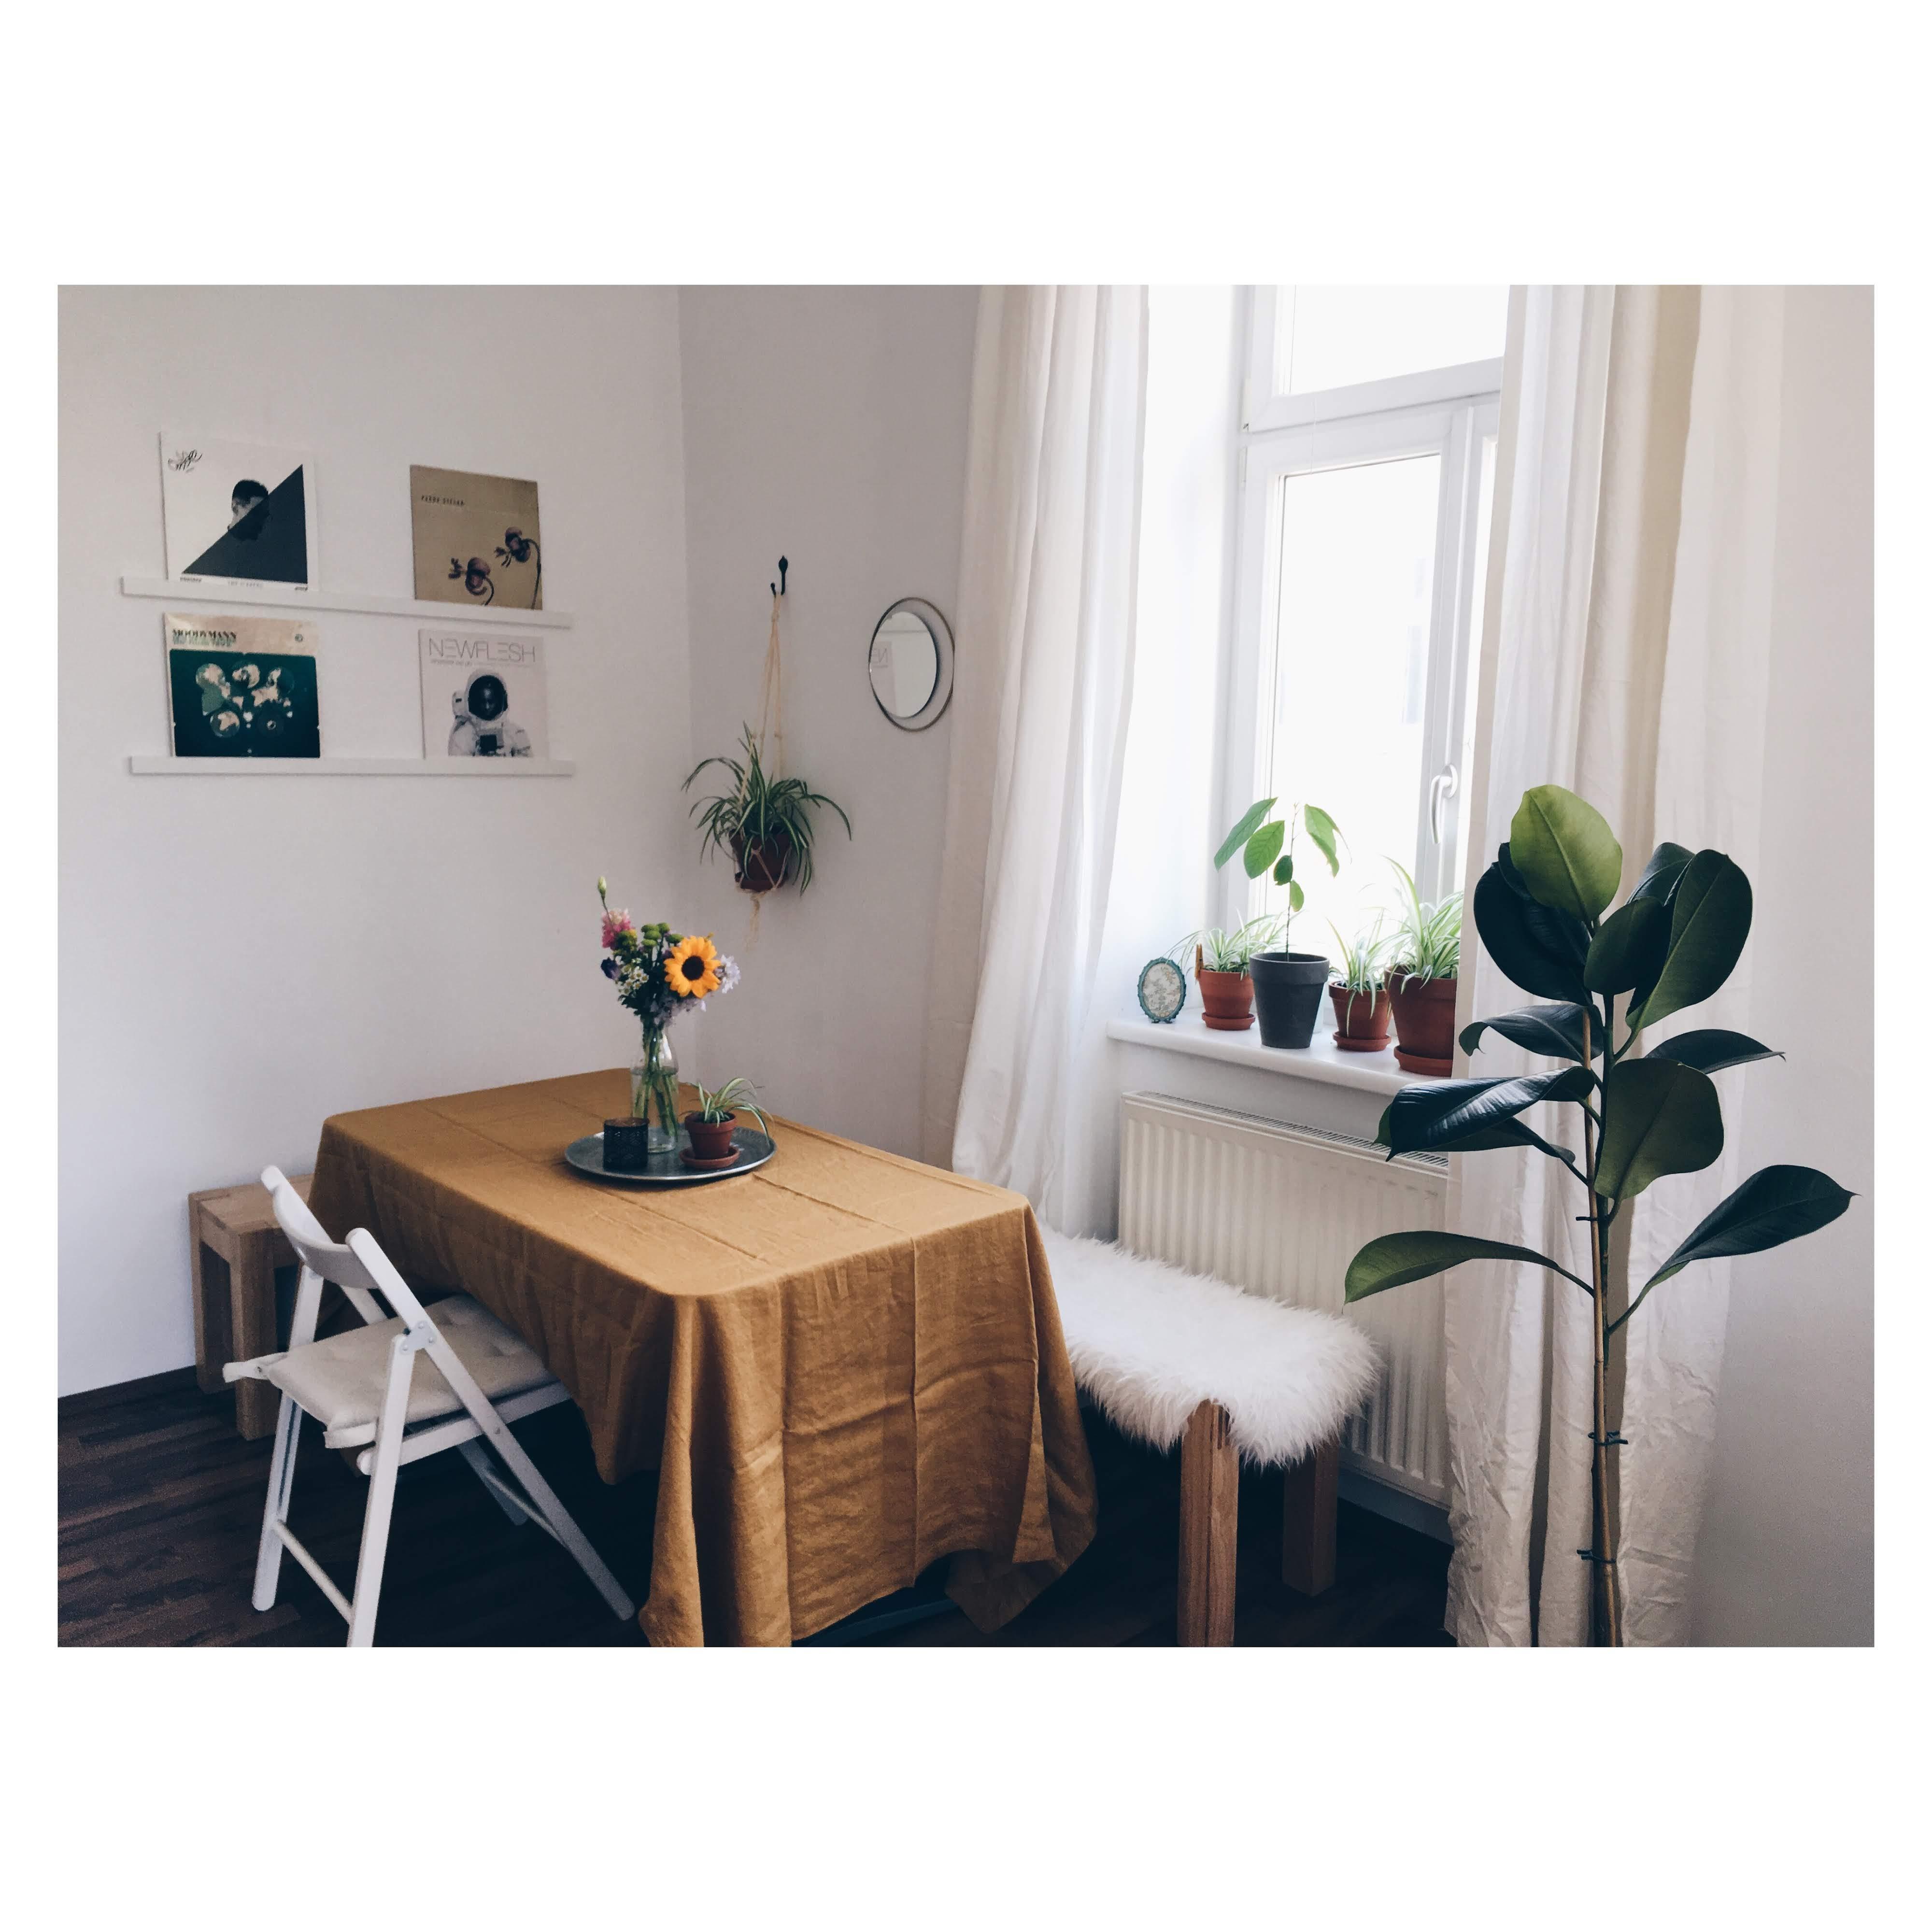 gelbe wand bilder ideen couch. Black Bedroom Furniture Sets. Home Design Ideas